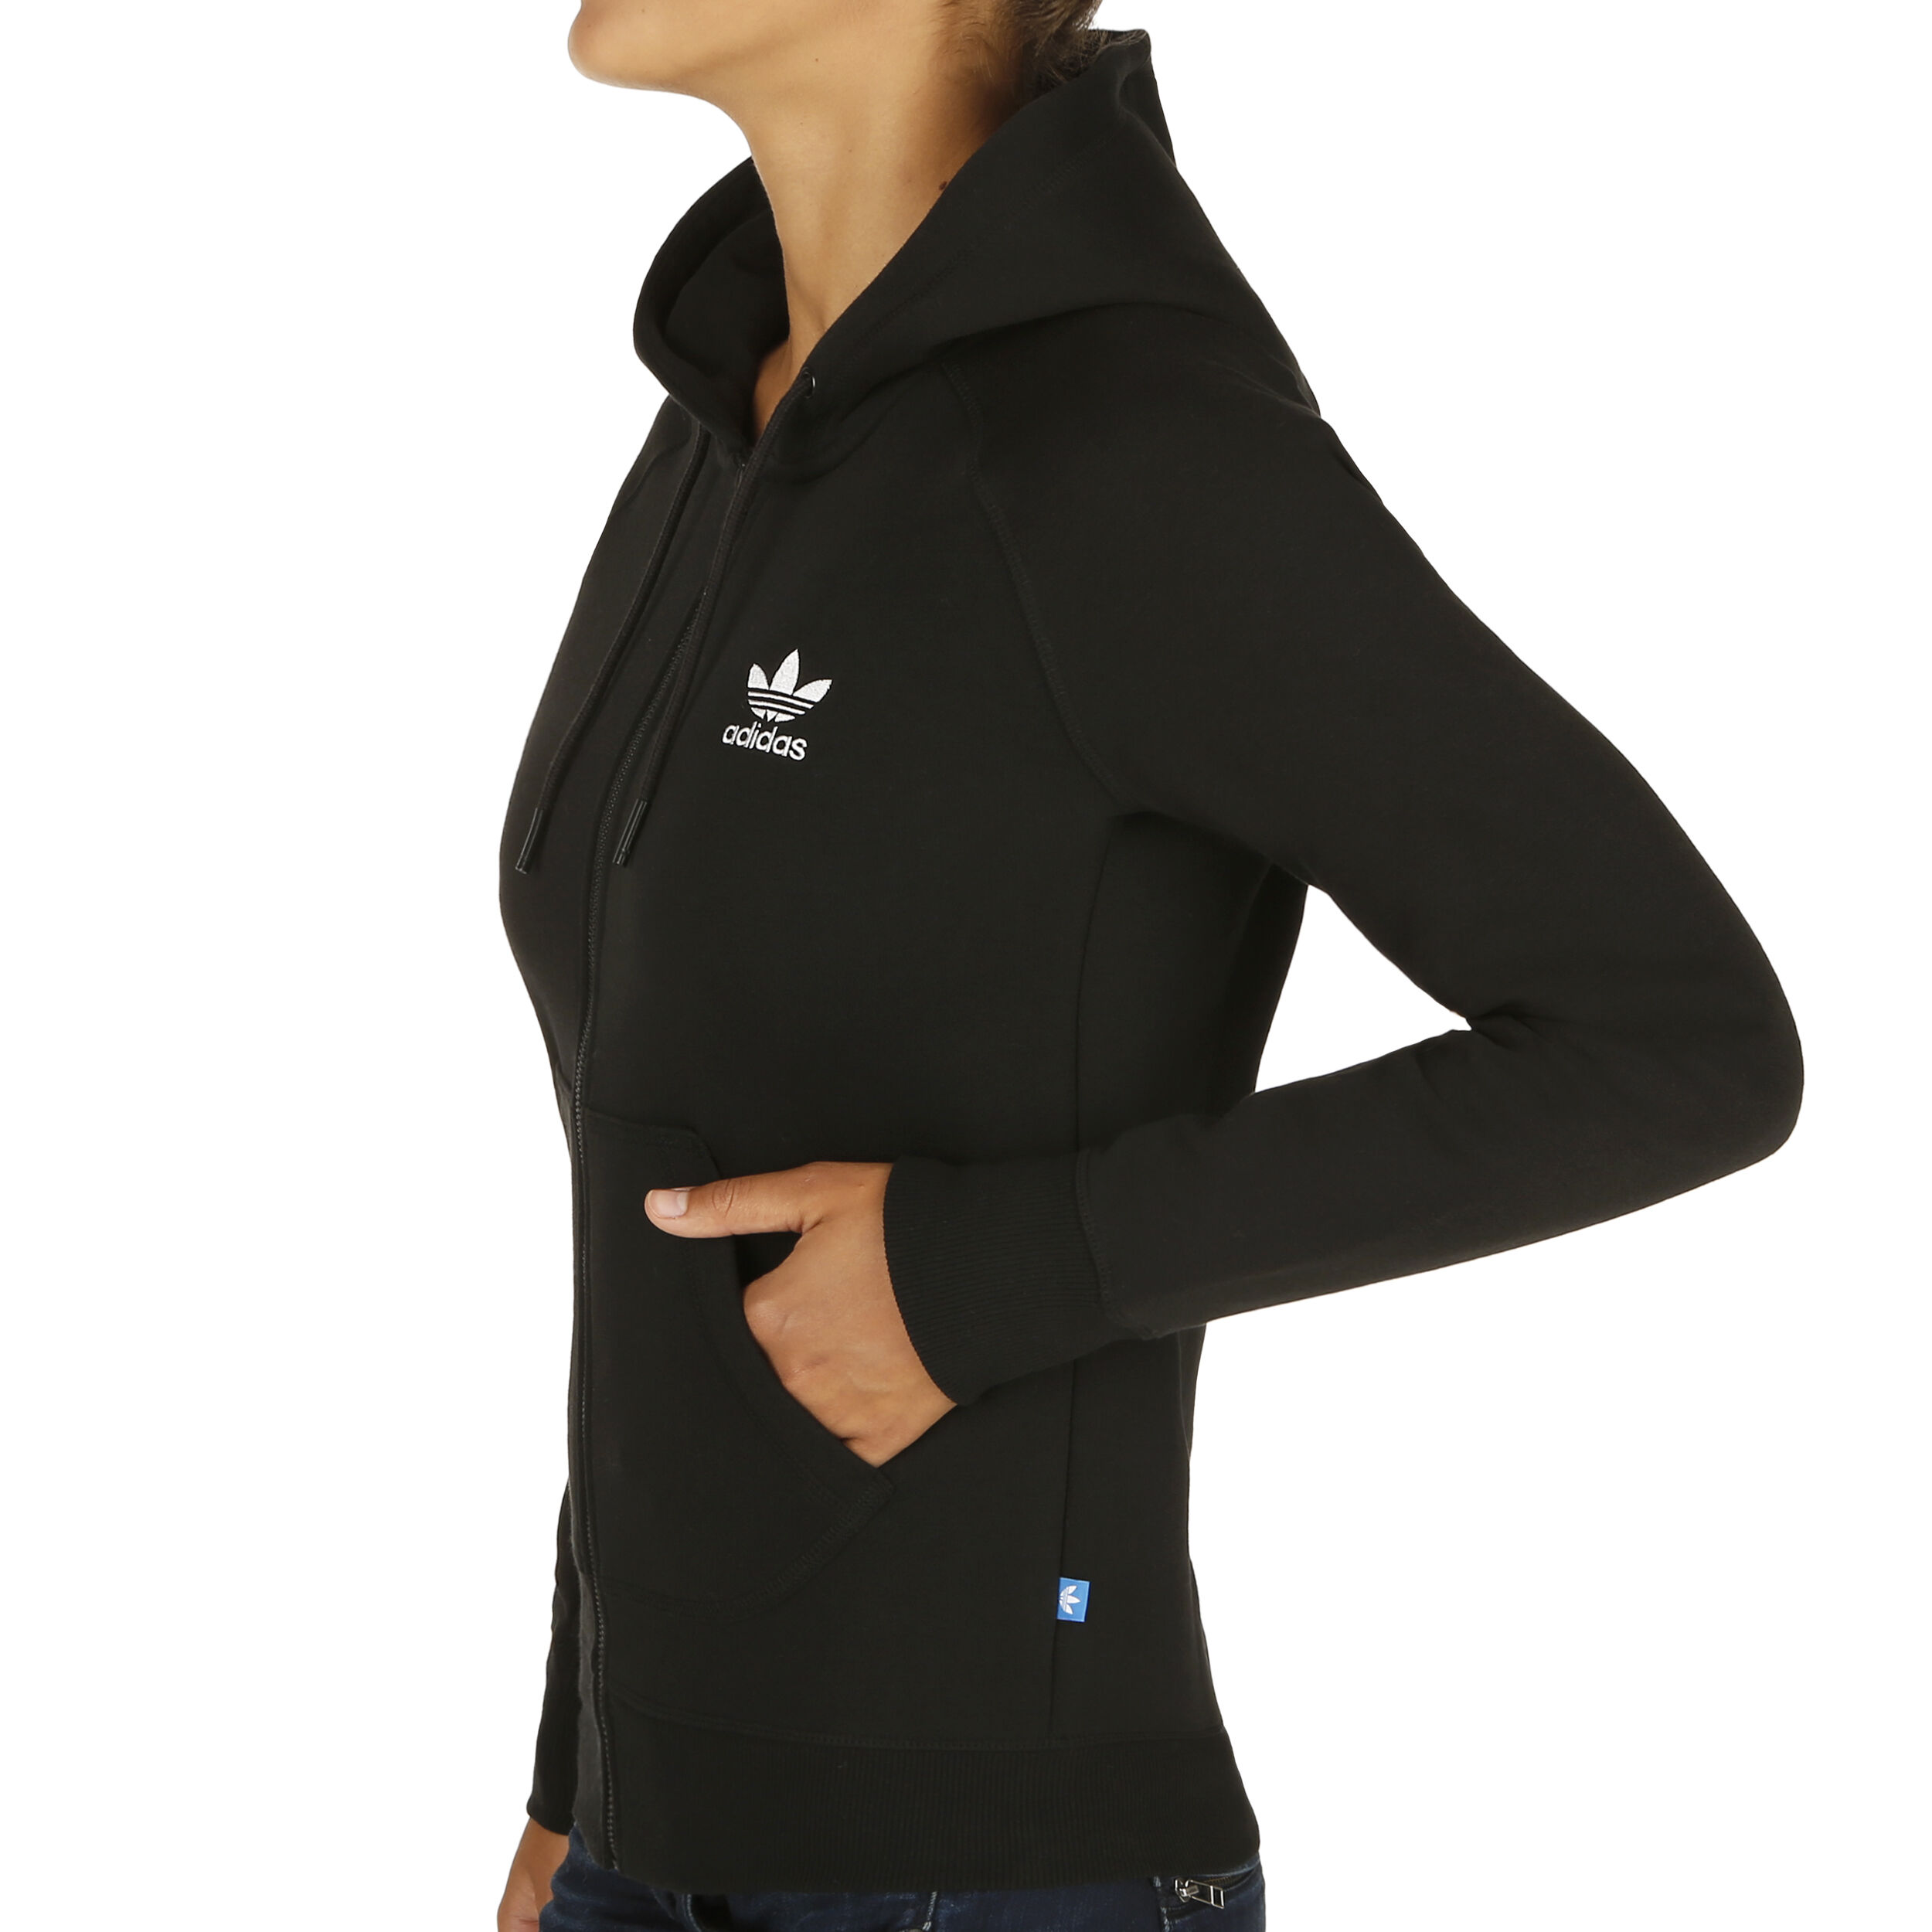 adidas Originals Full Zip Sweatjacke Damen Schwarz online